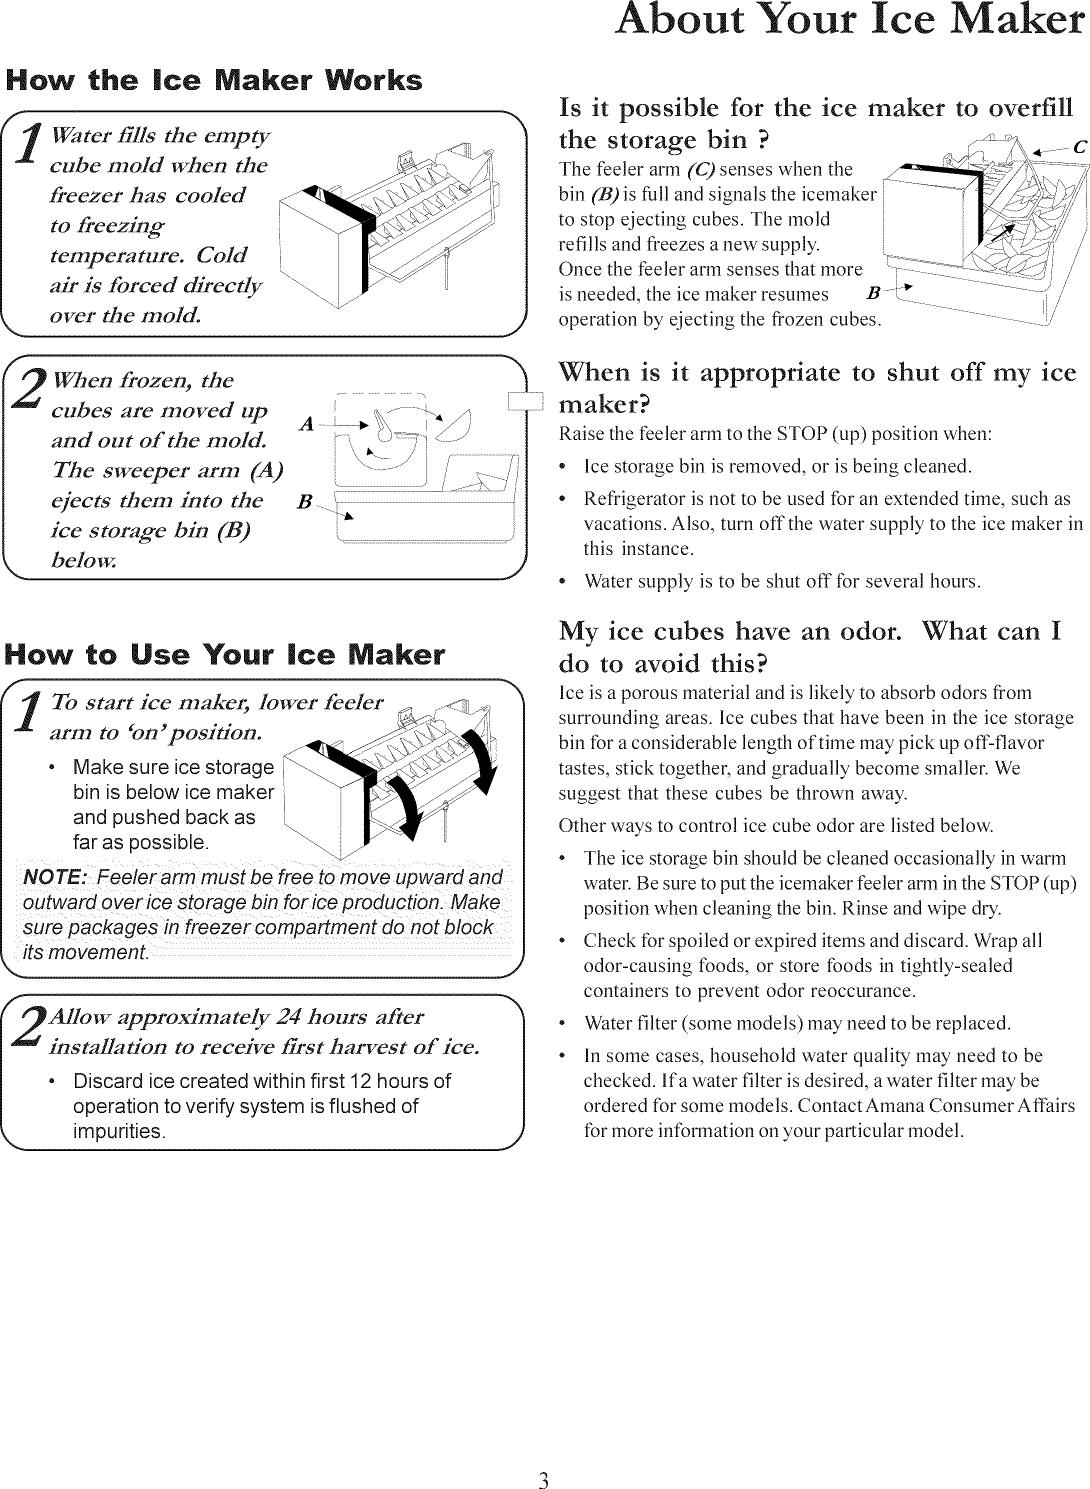 AMANA Ice Maker Kits Manual L1003084